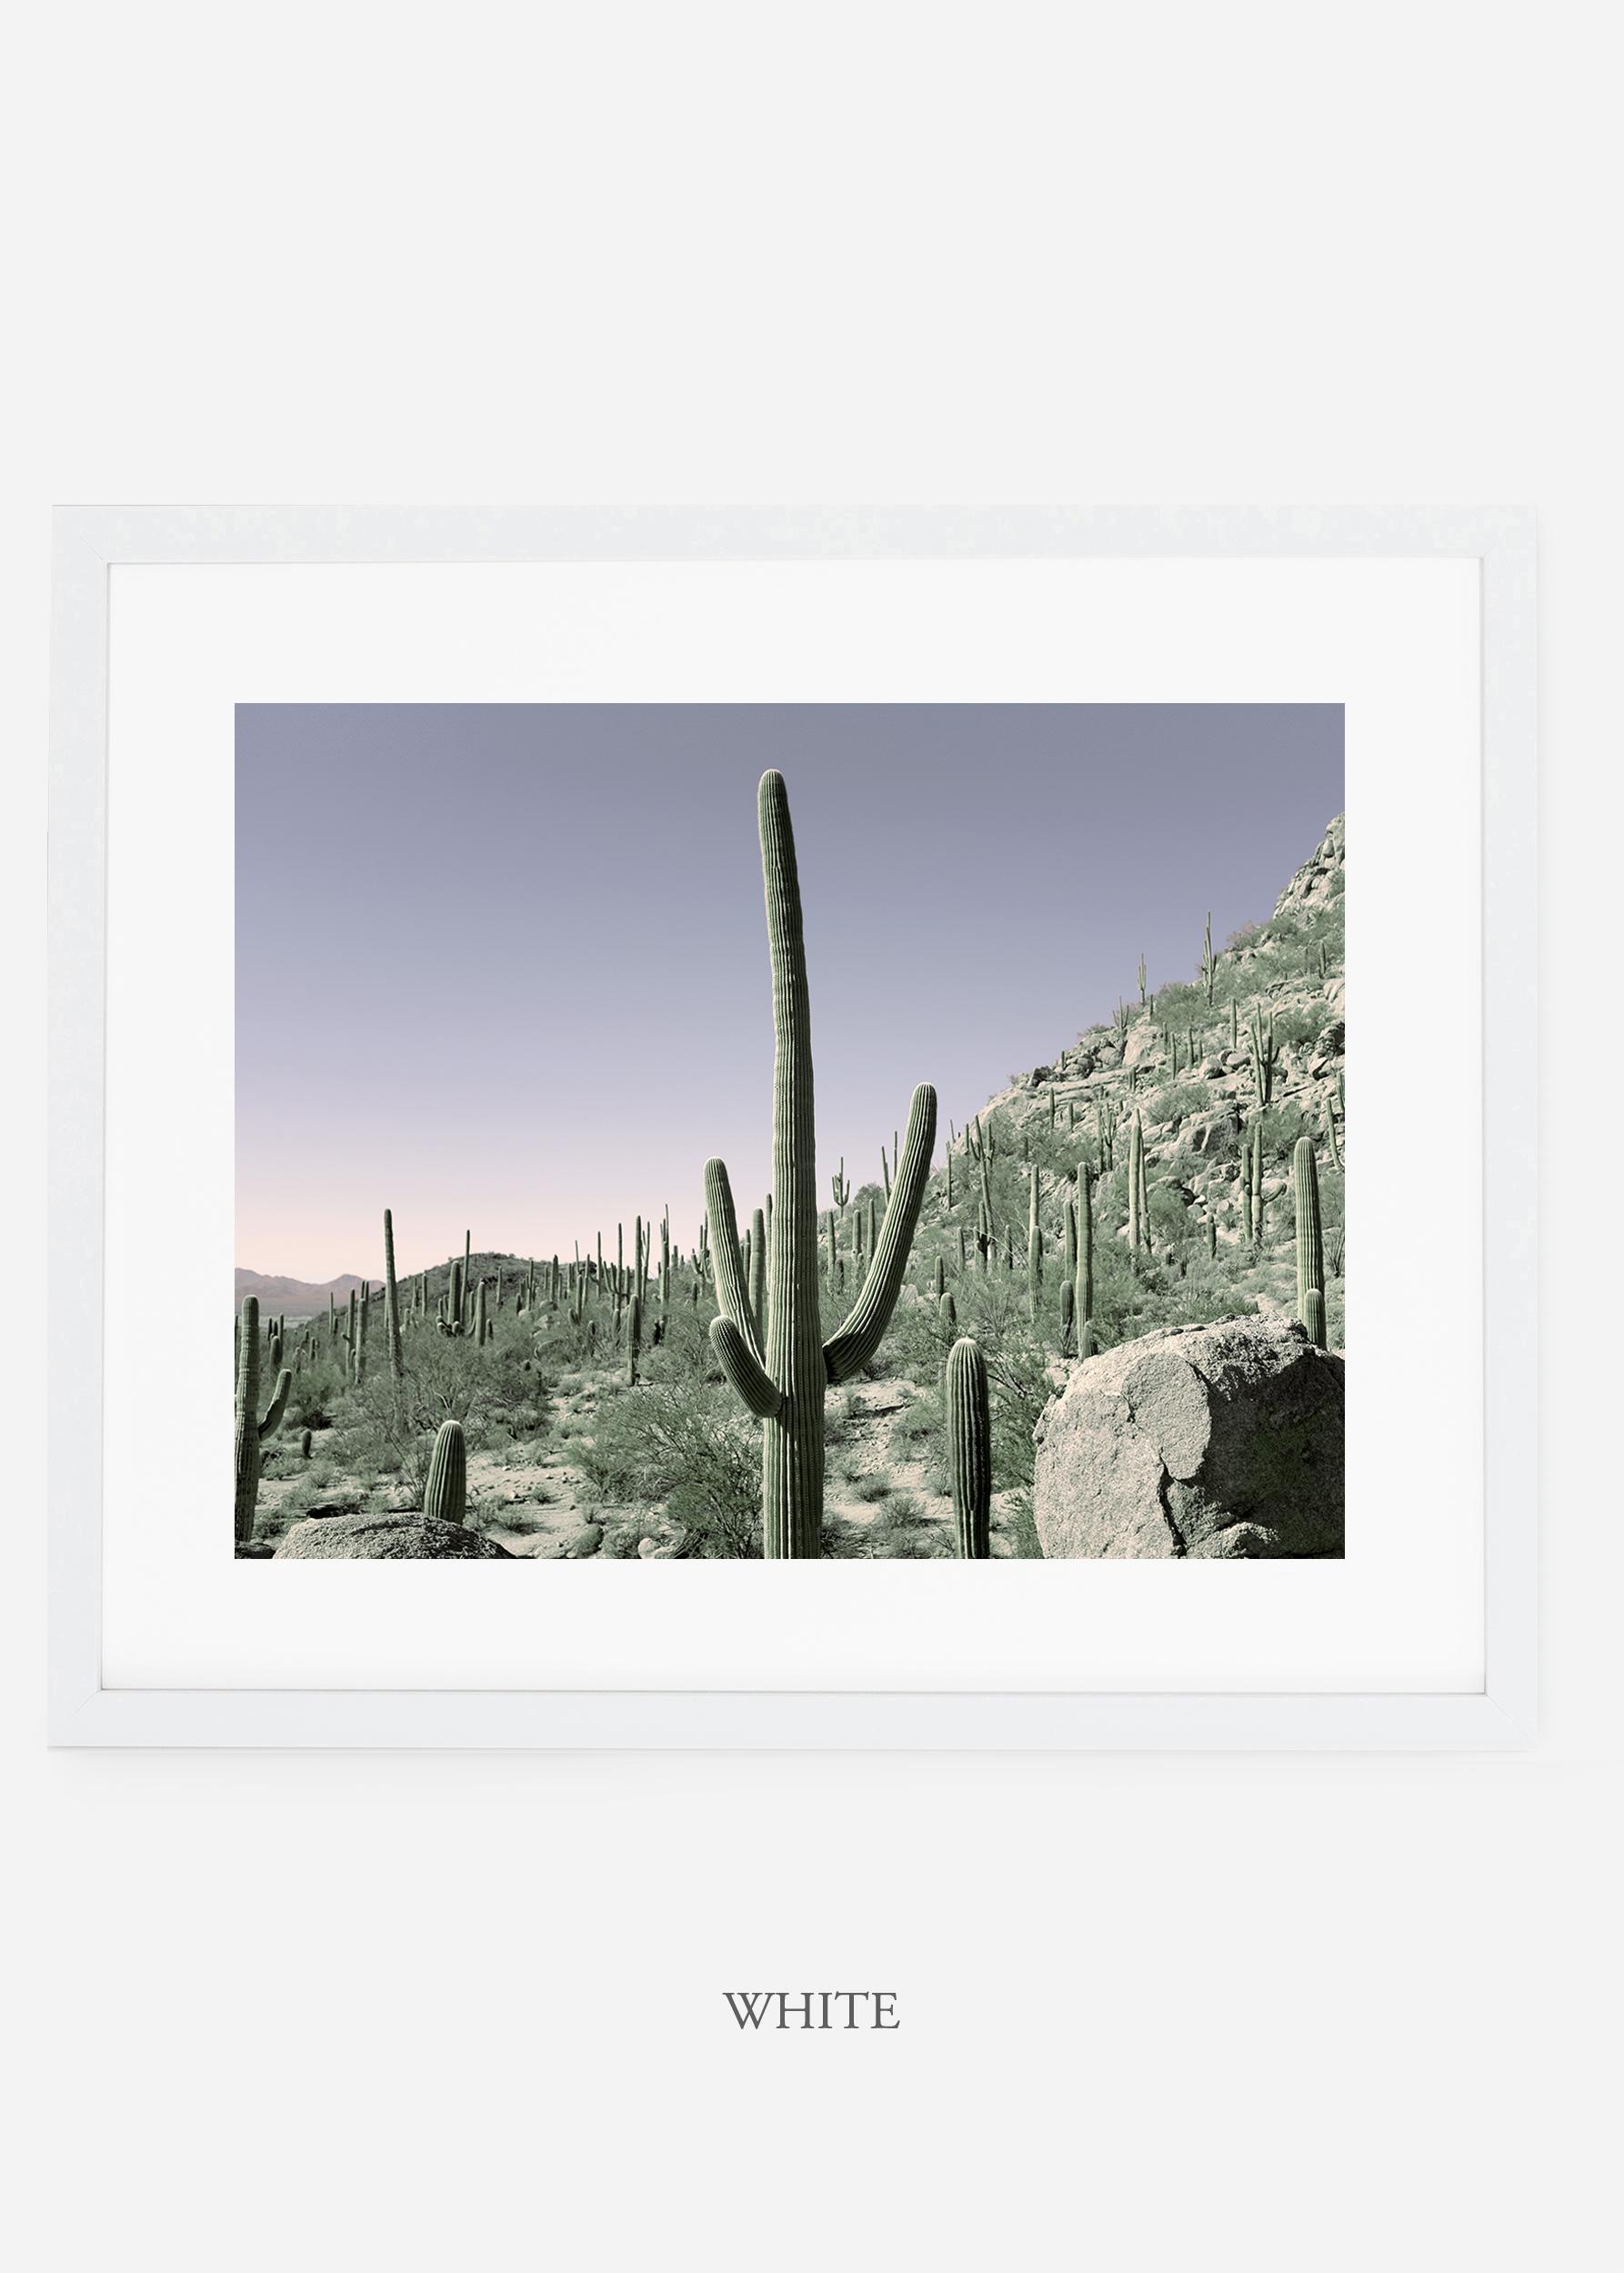 whiteframe-saguaroNo.13-wildercalifornia-art-wallart-cactusprint-homedecor-prints-arizona-botanical-artwork-interiordesign.jpg